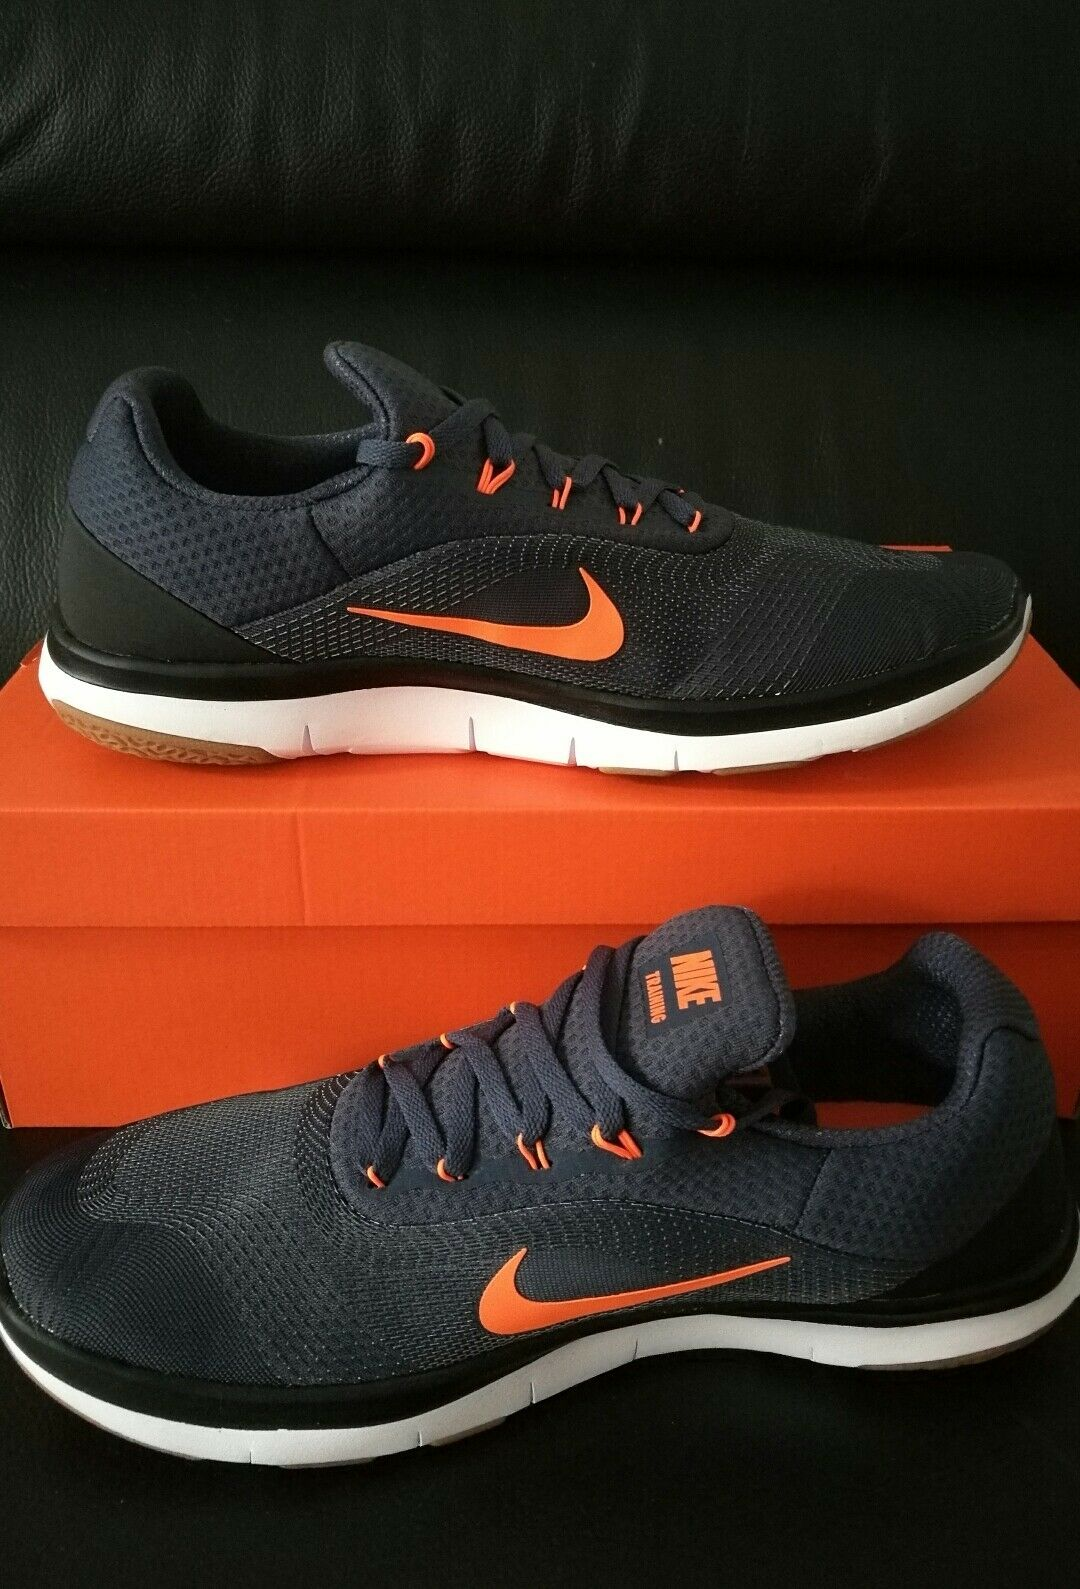 Uomini Nike Free Trainer V 7, misura eur 45.5, BNWB